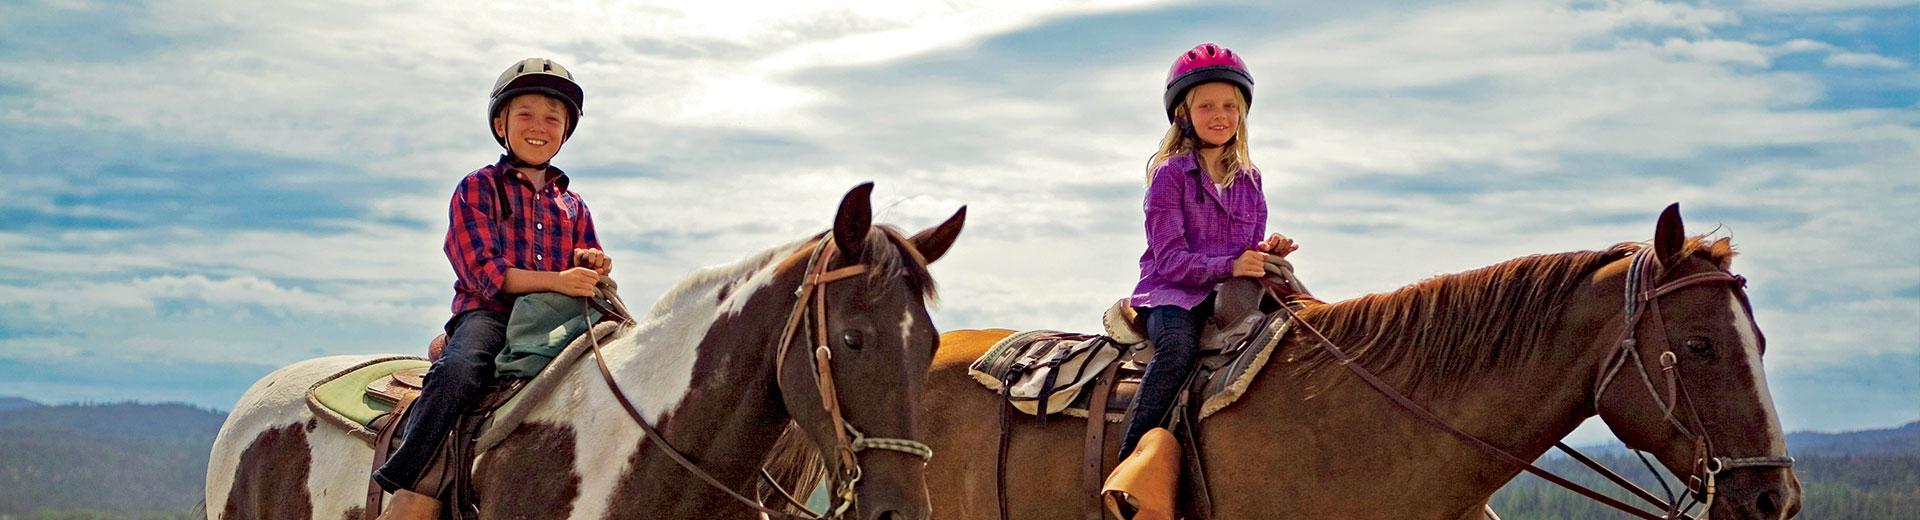 Equestrian Lessons